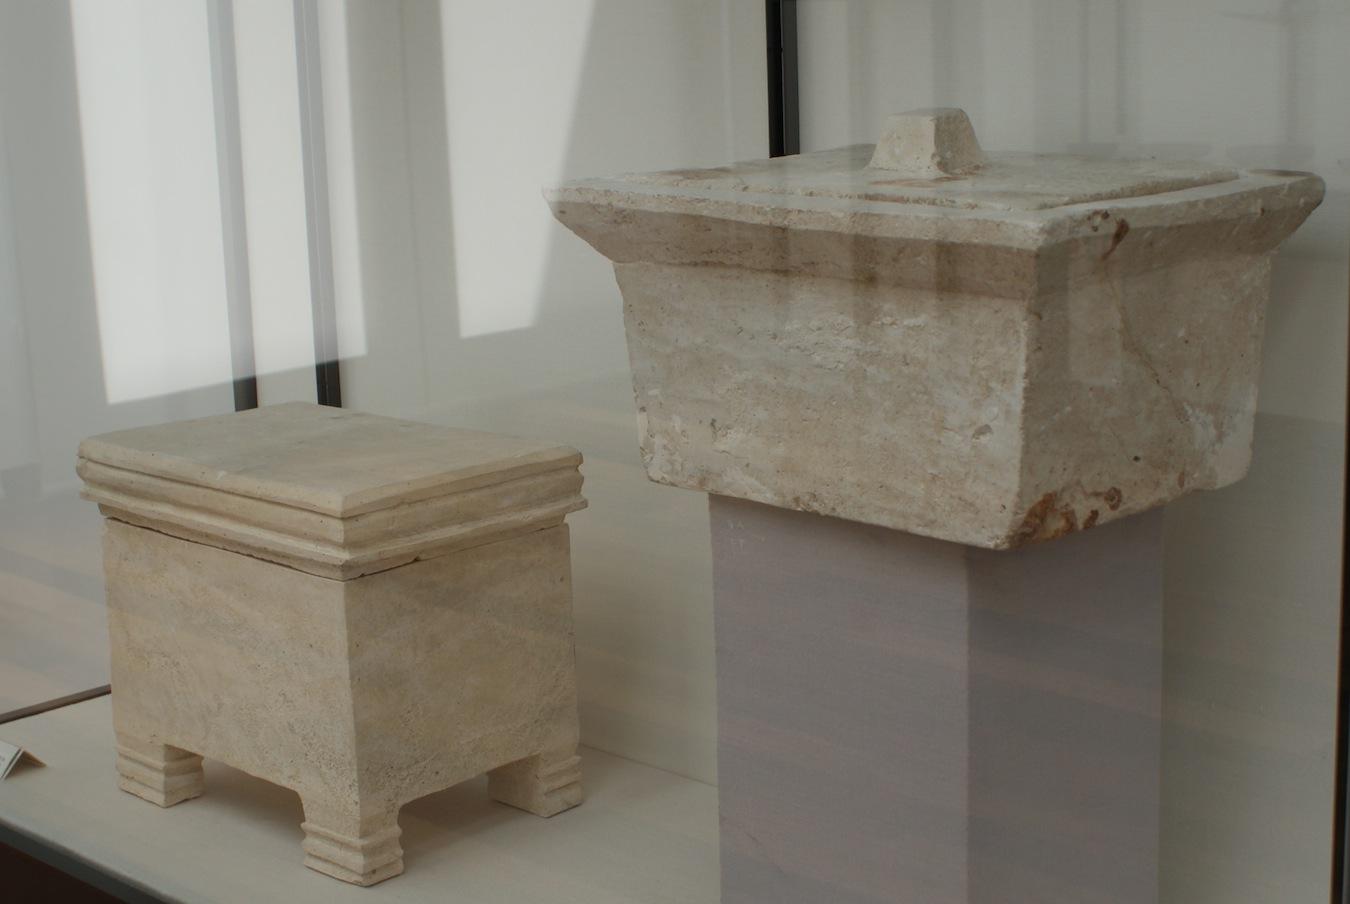 https://www.museoarqueologicobaza.es/wp-content/uploads/2013/03/DSC08346.jpg